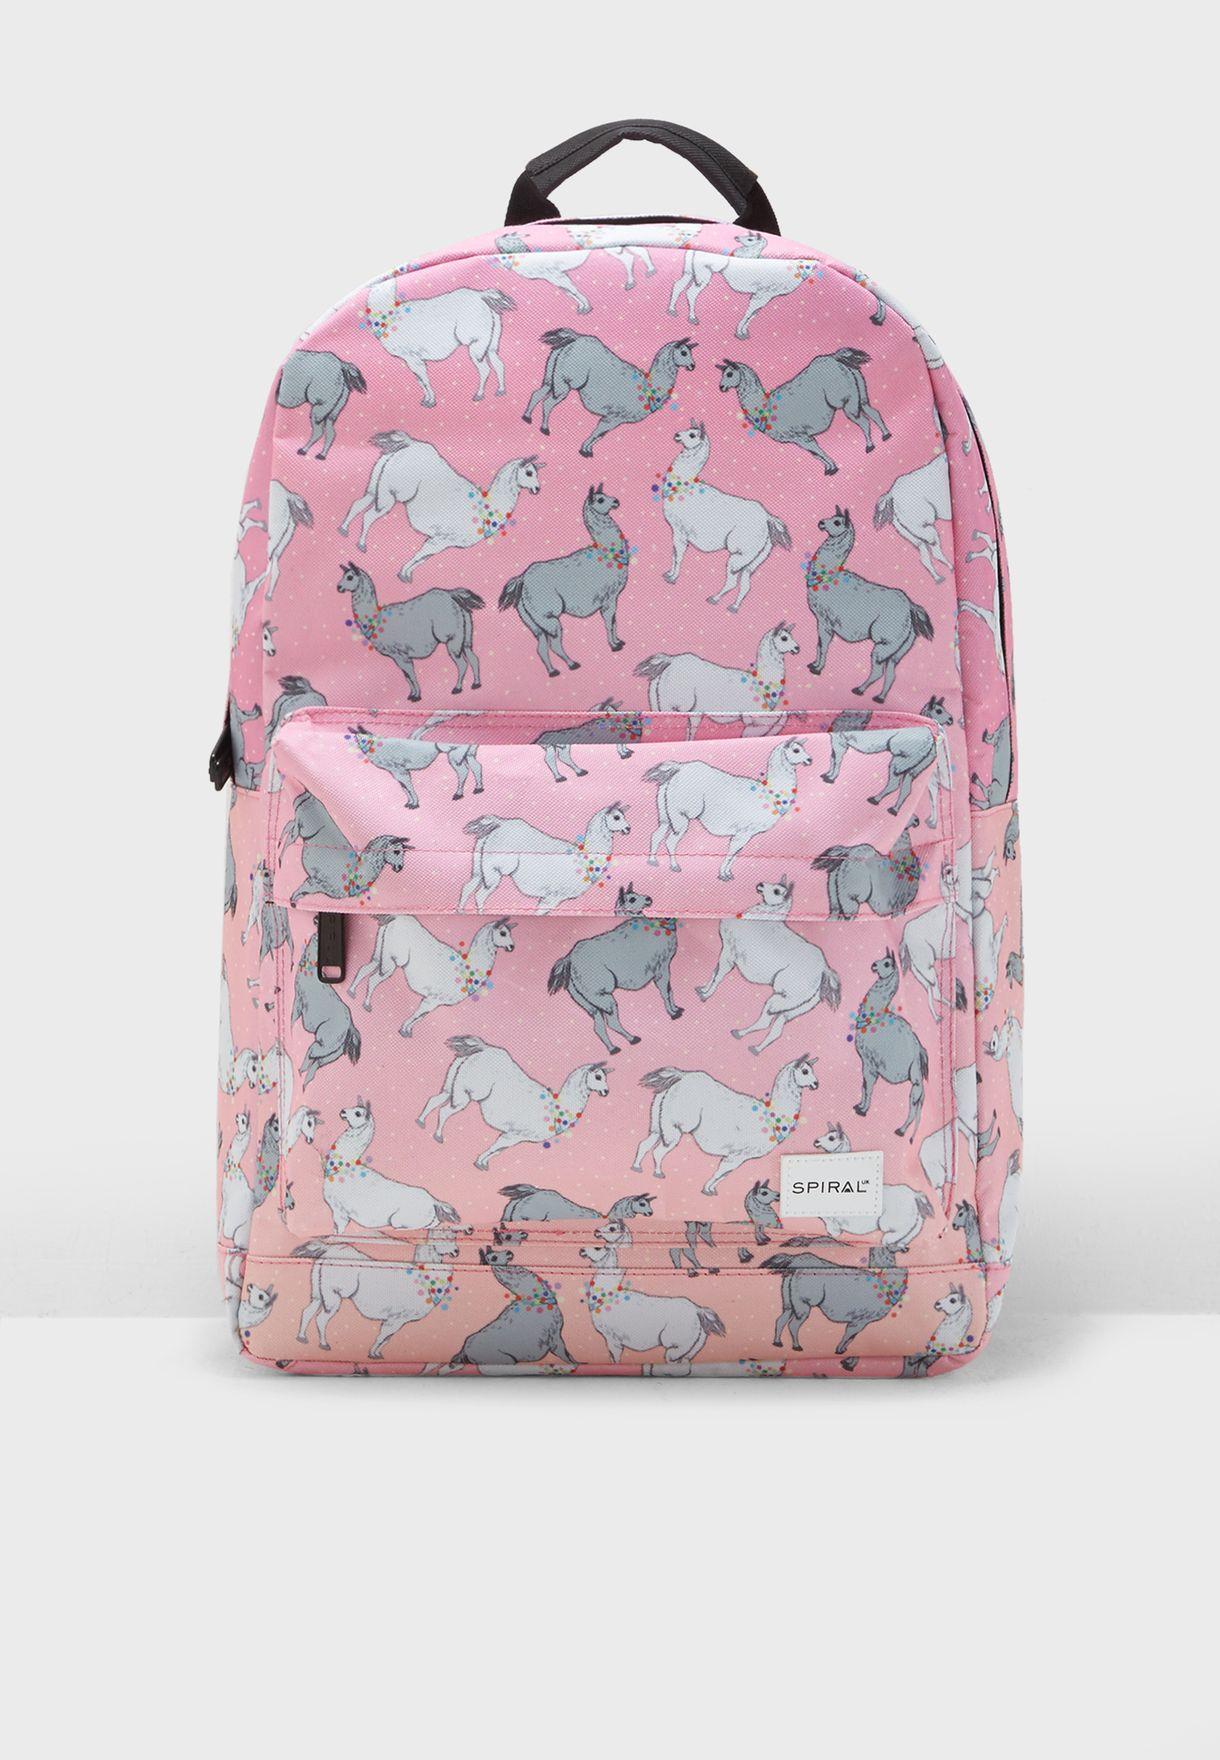 Llama Land Backpack